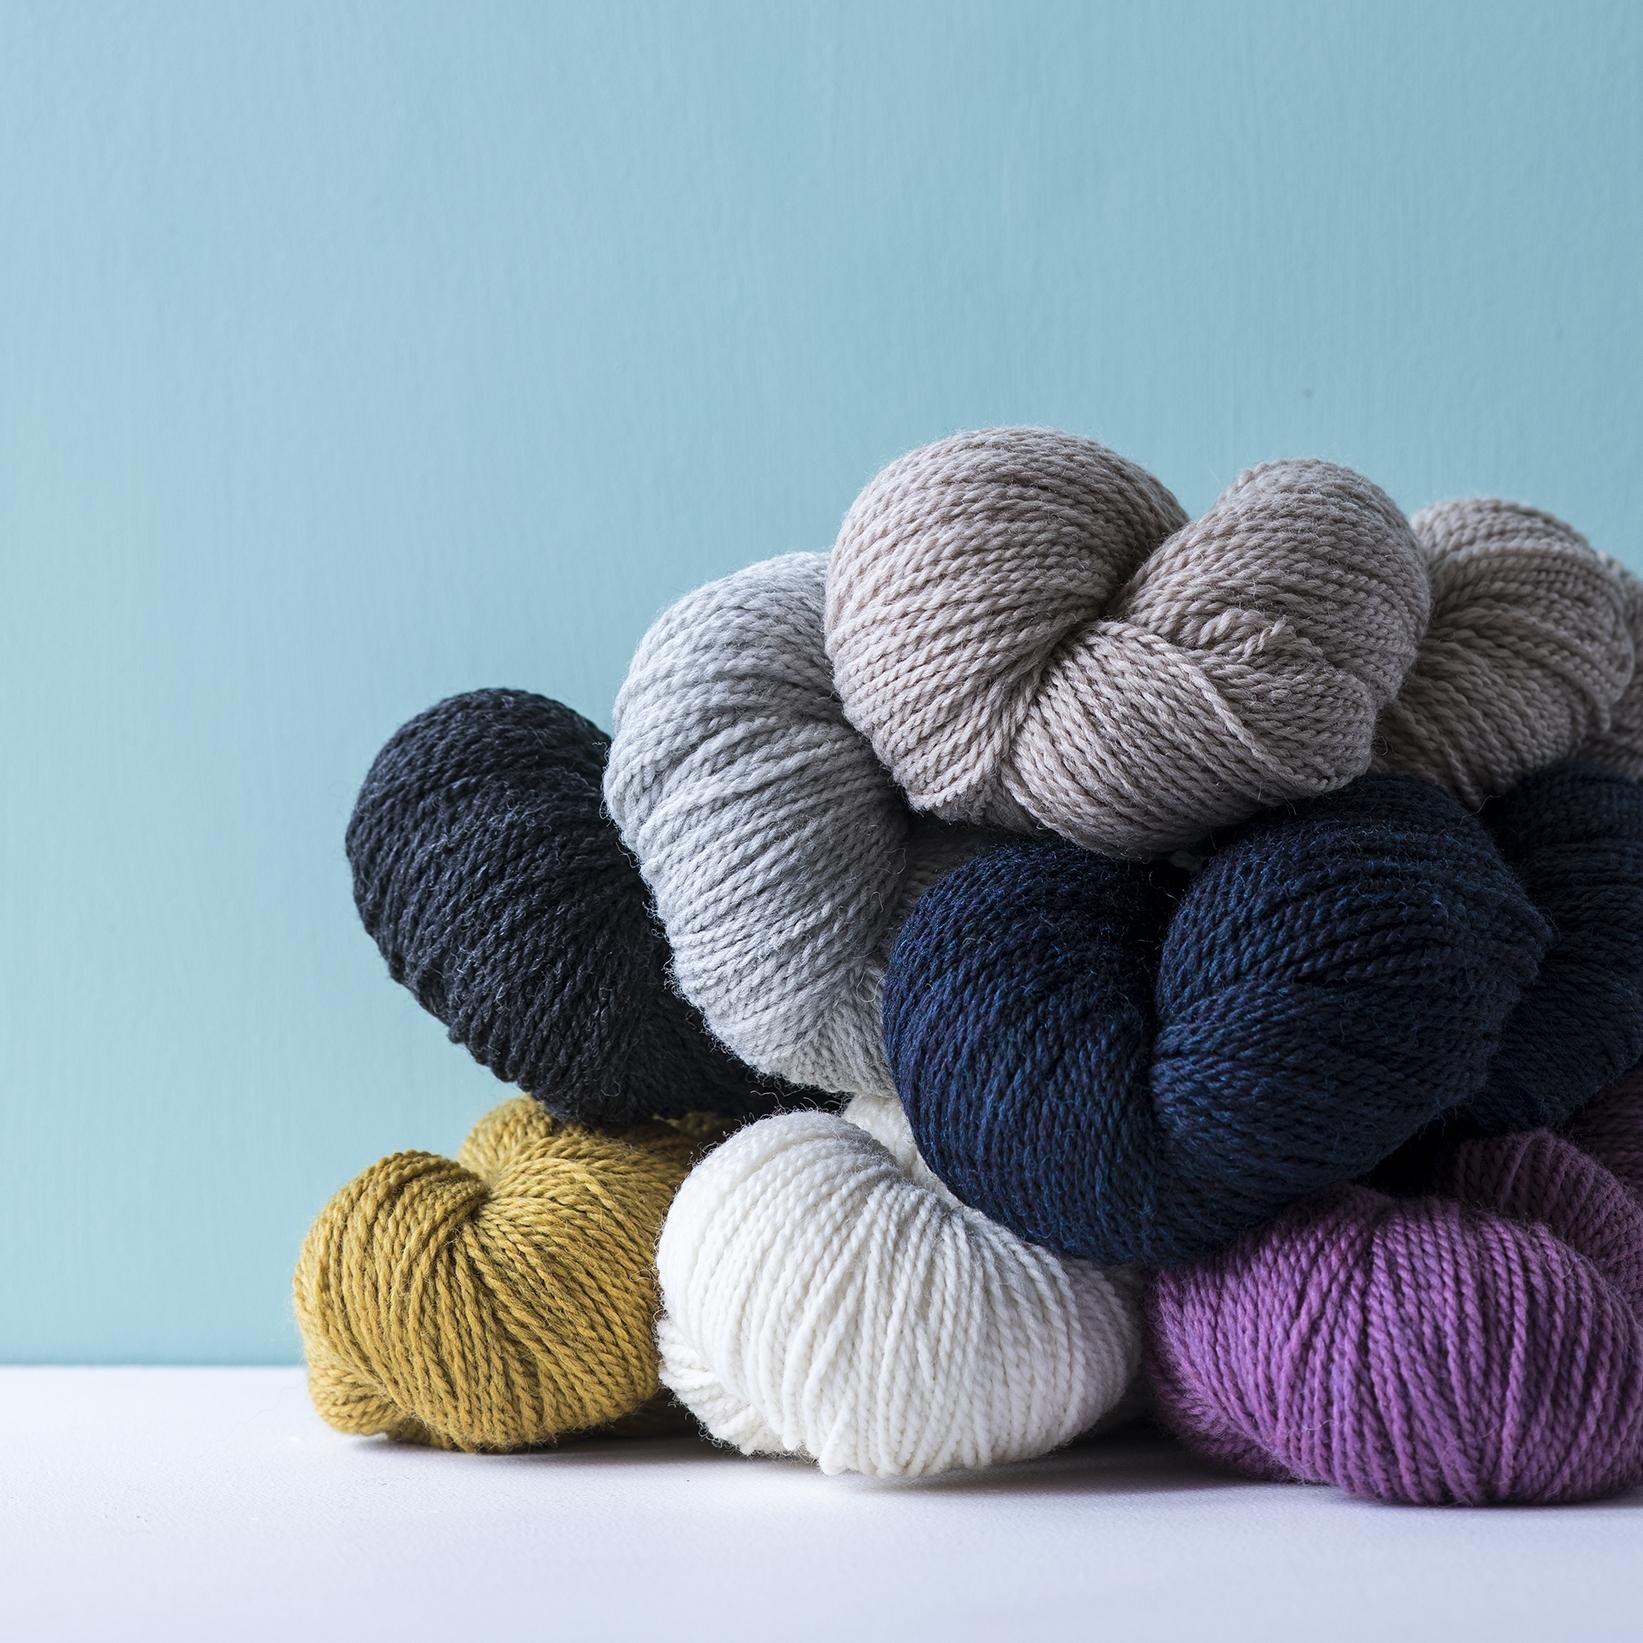 SCOUT   100% Wool  274 yard / 100 gm skein